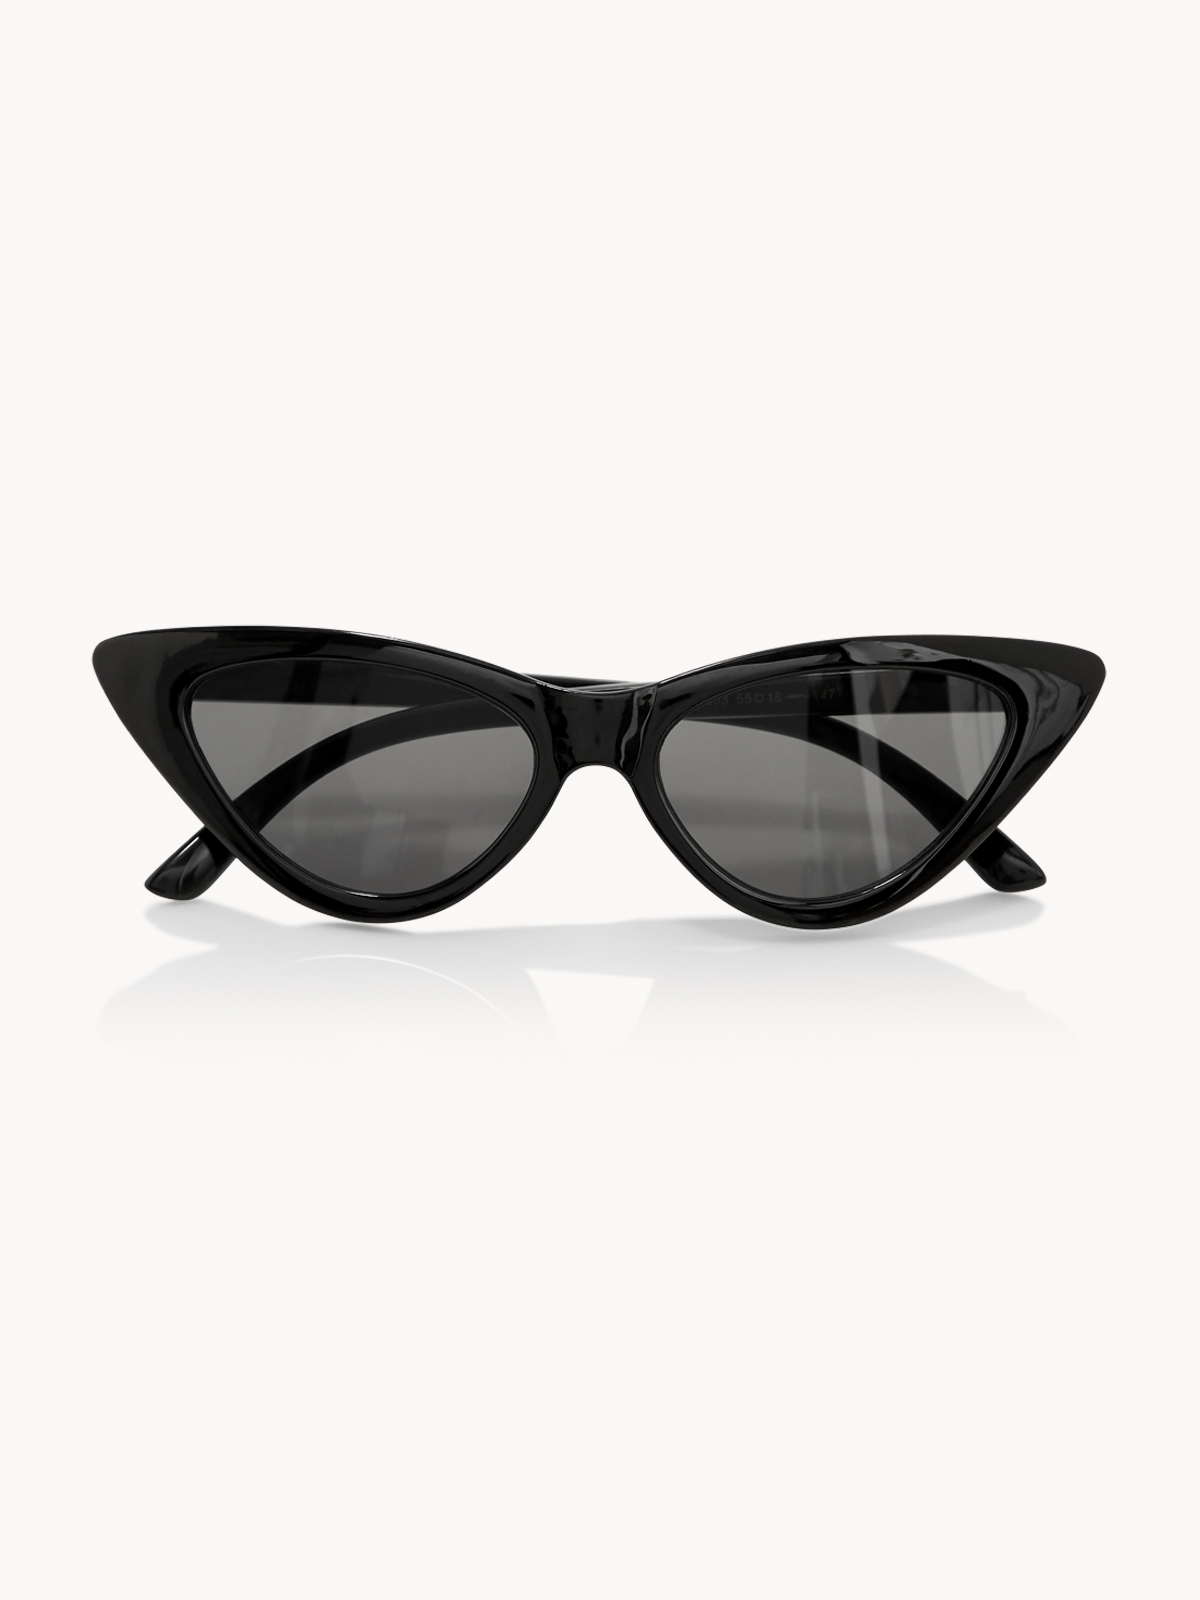 Reflective Lens Cat Eye Sunglasses Black